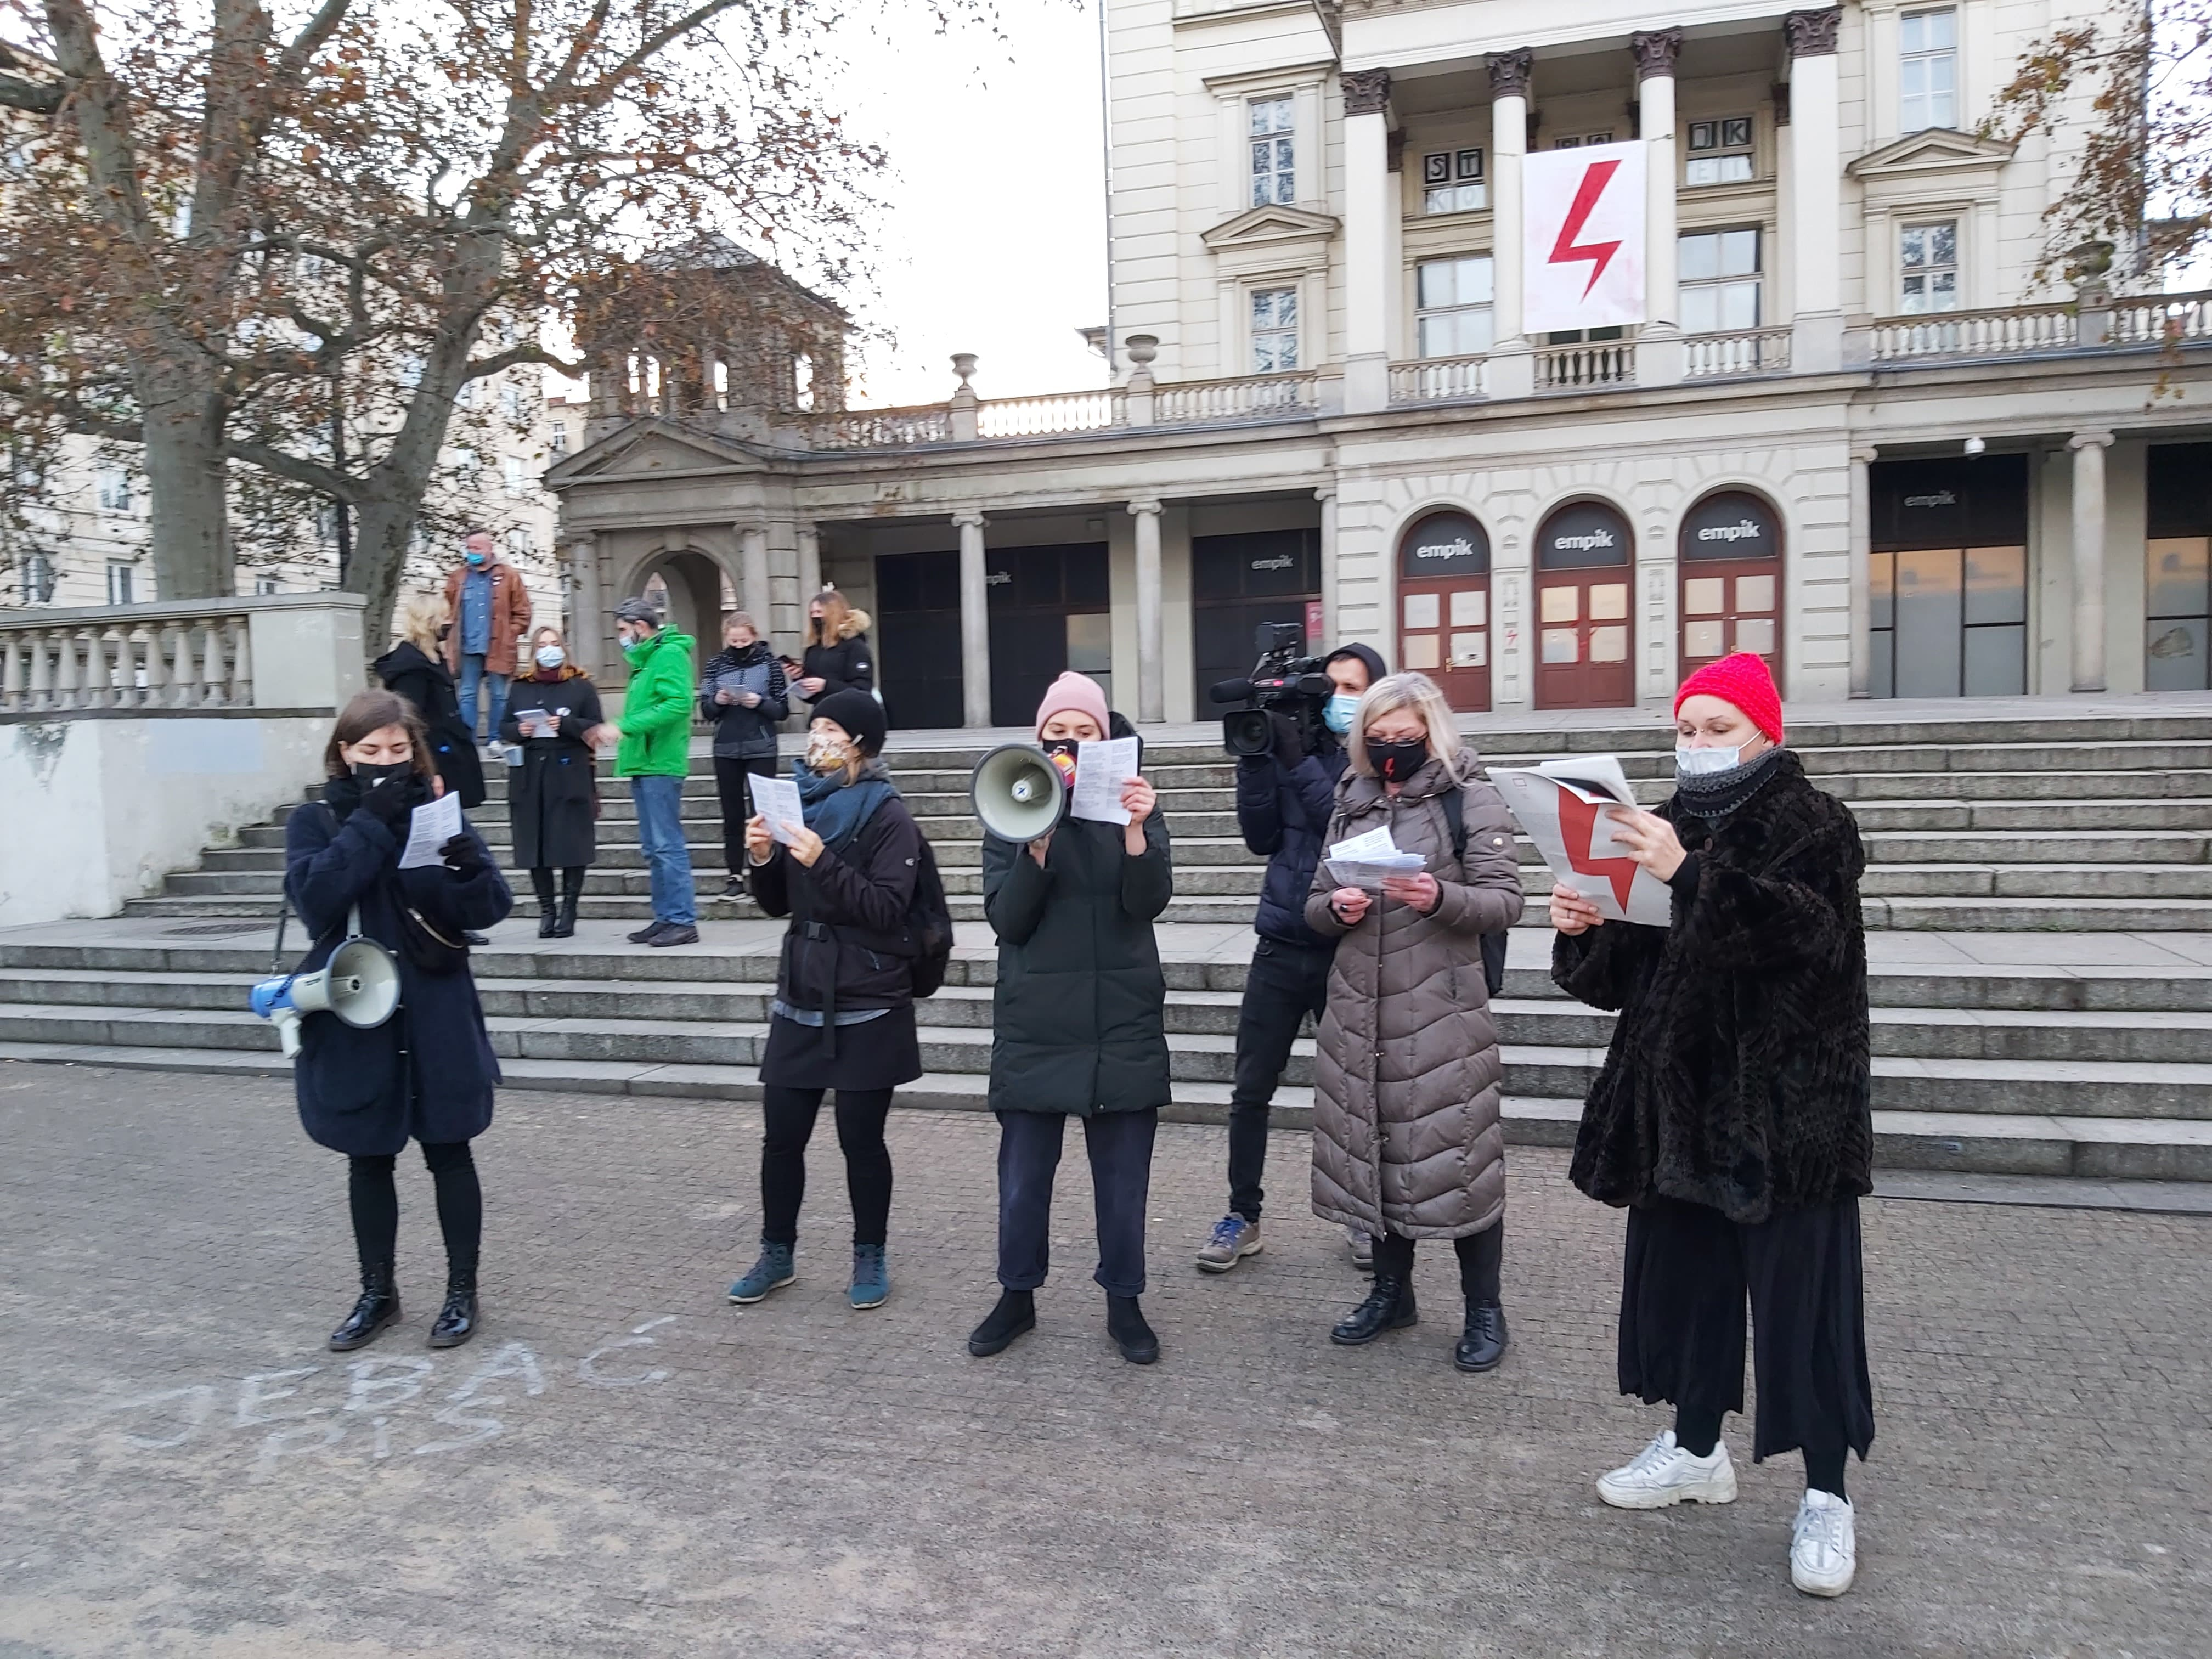 kolędy protest aborcja - Krzysztof Polasik